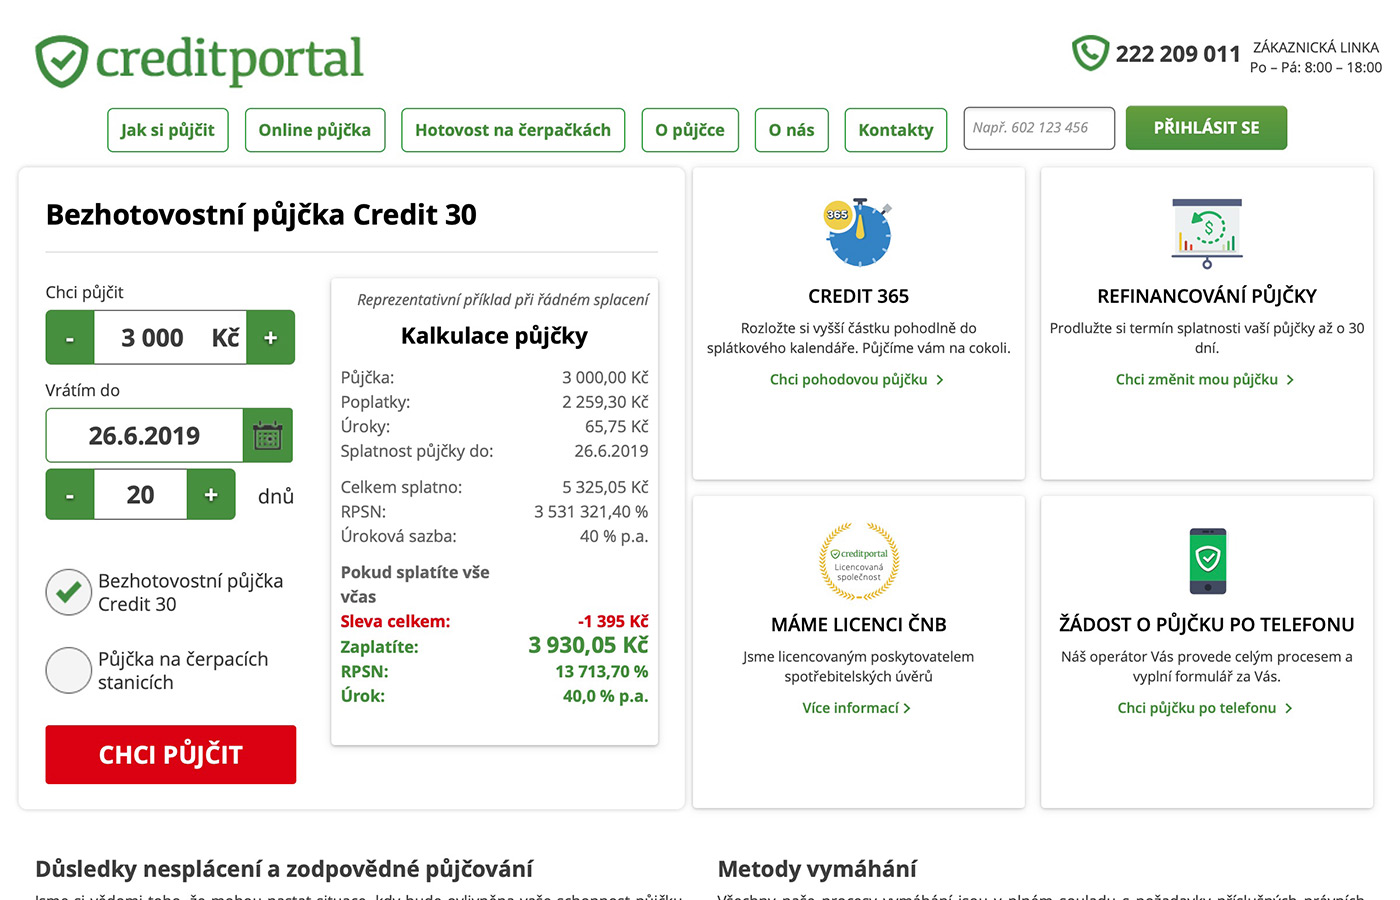 Náhled webu https://www.creditportal.cz/cs/kb/hotovostni-pujcka-na-cerpackach